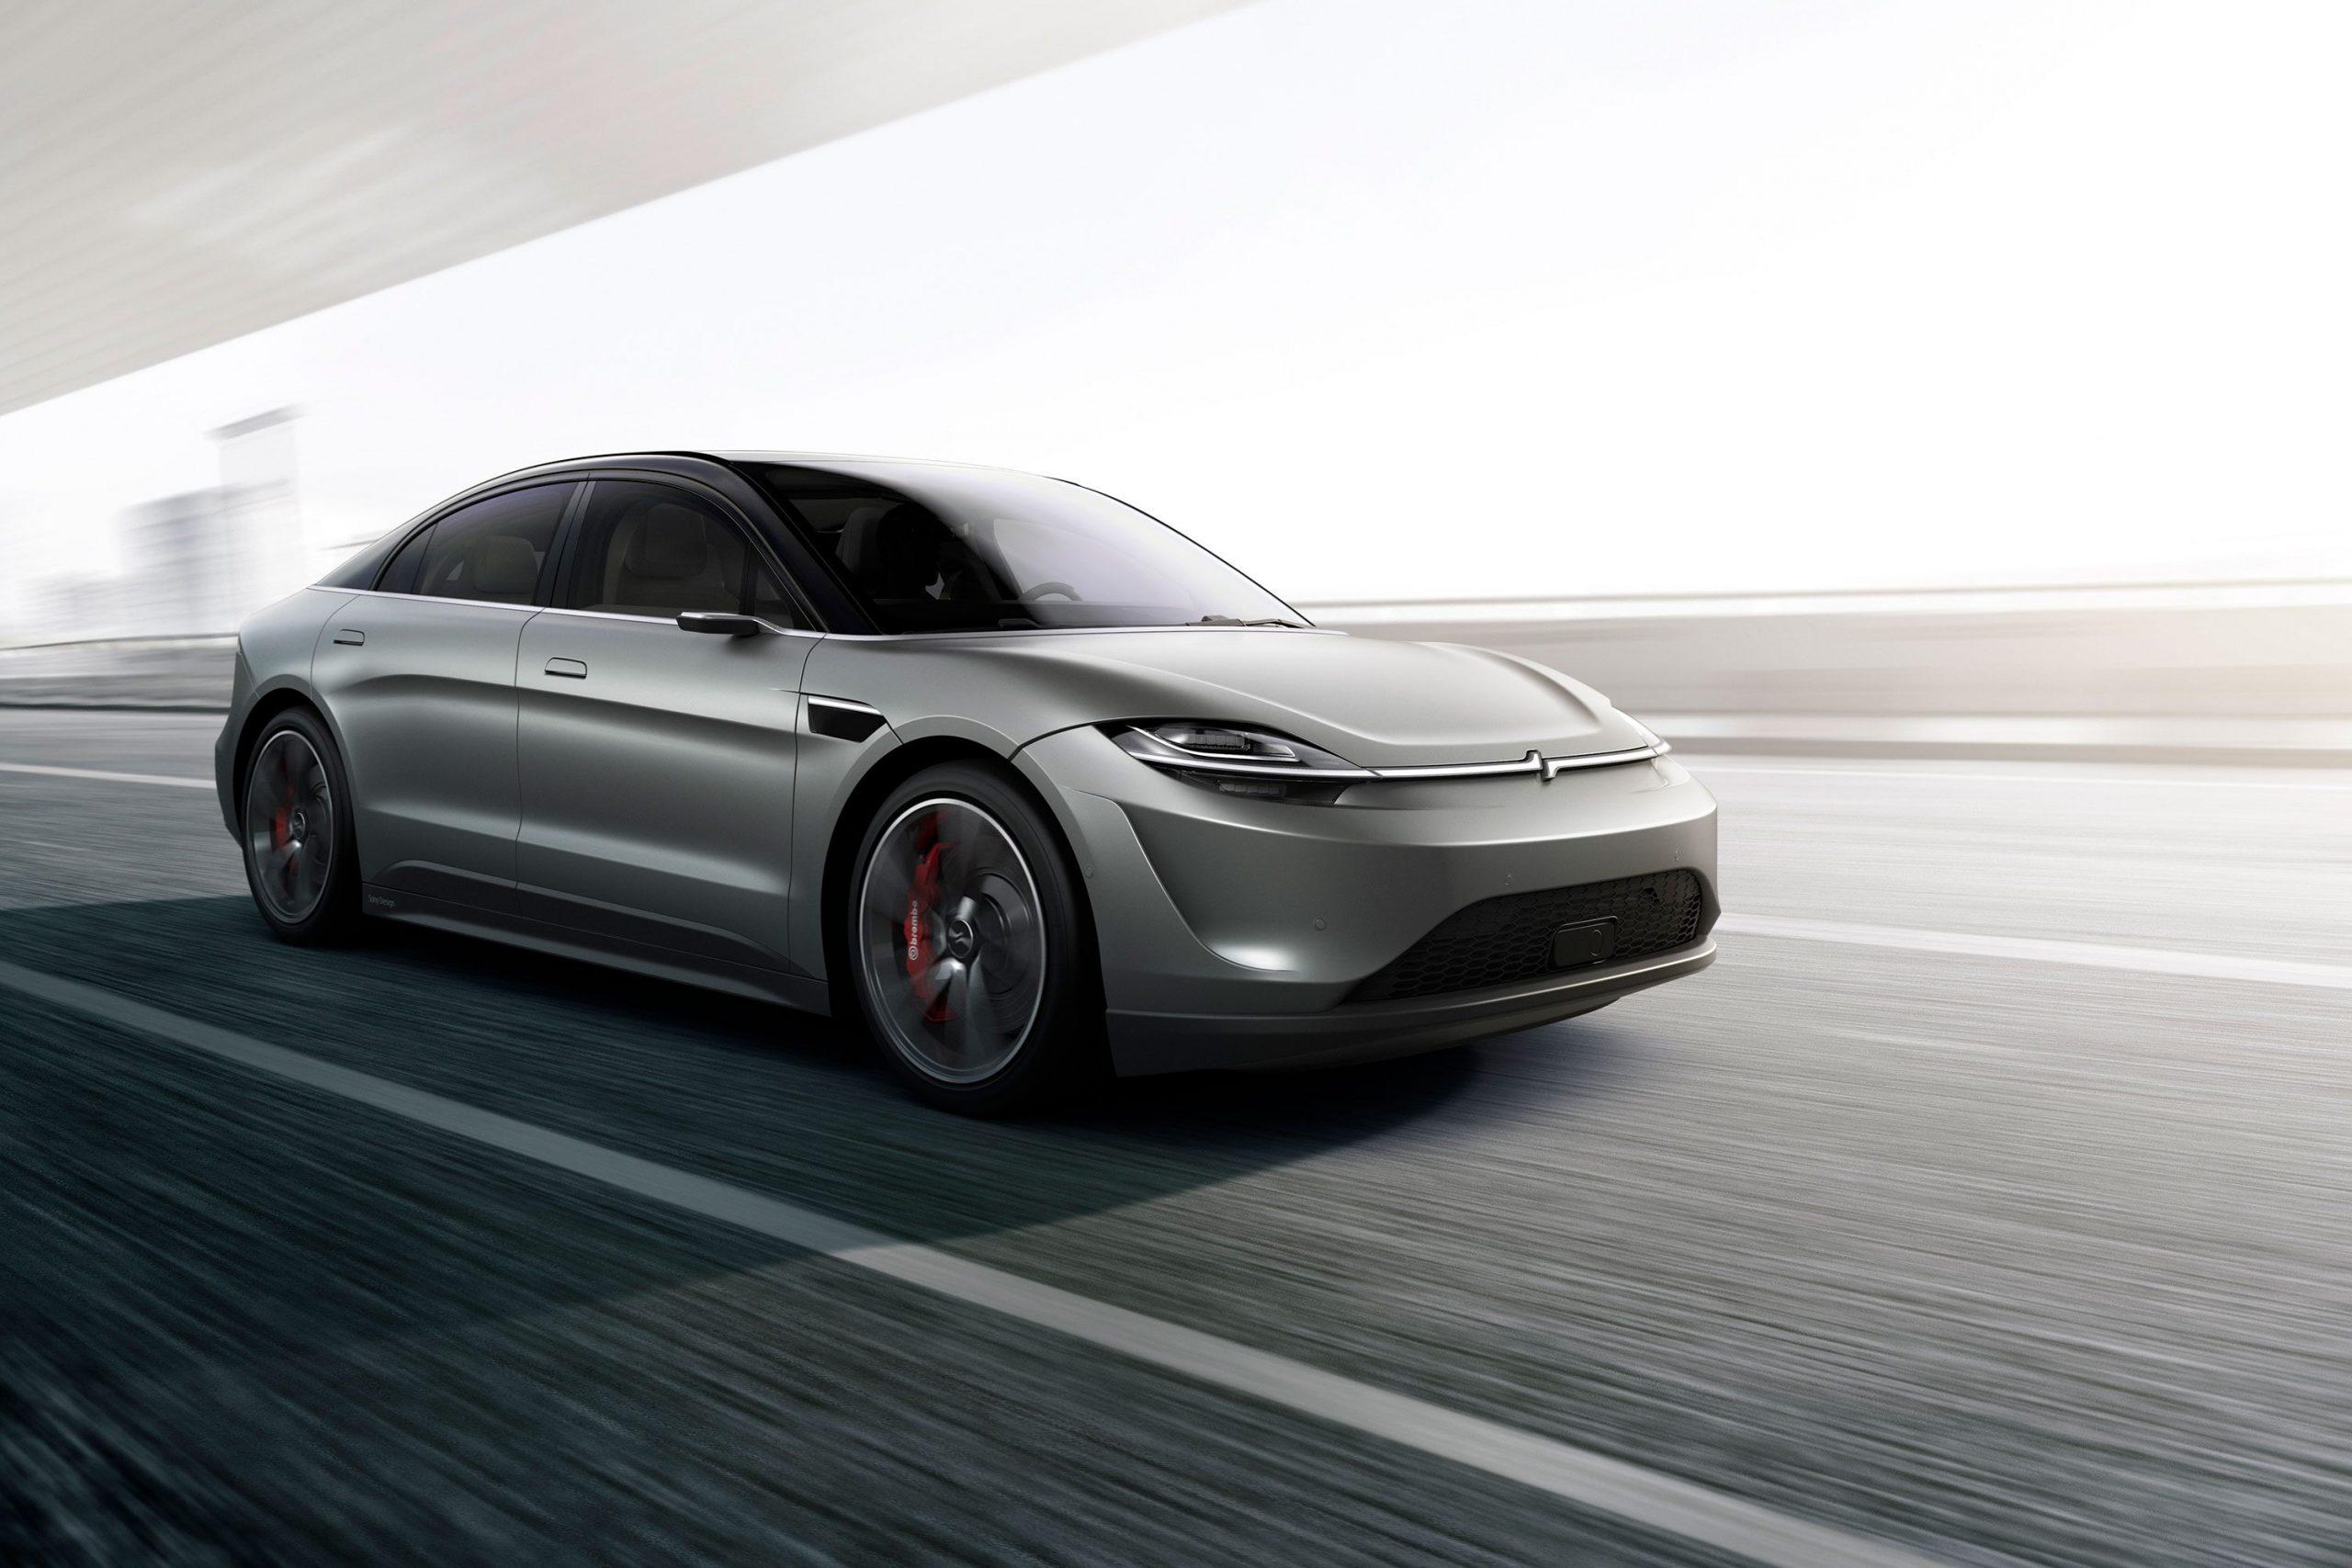 CES 2020: Sony Vision-S Concept Car Unveiled 14